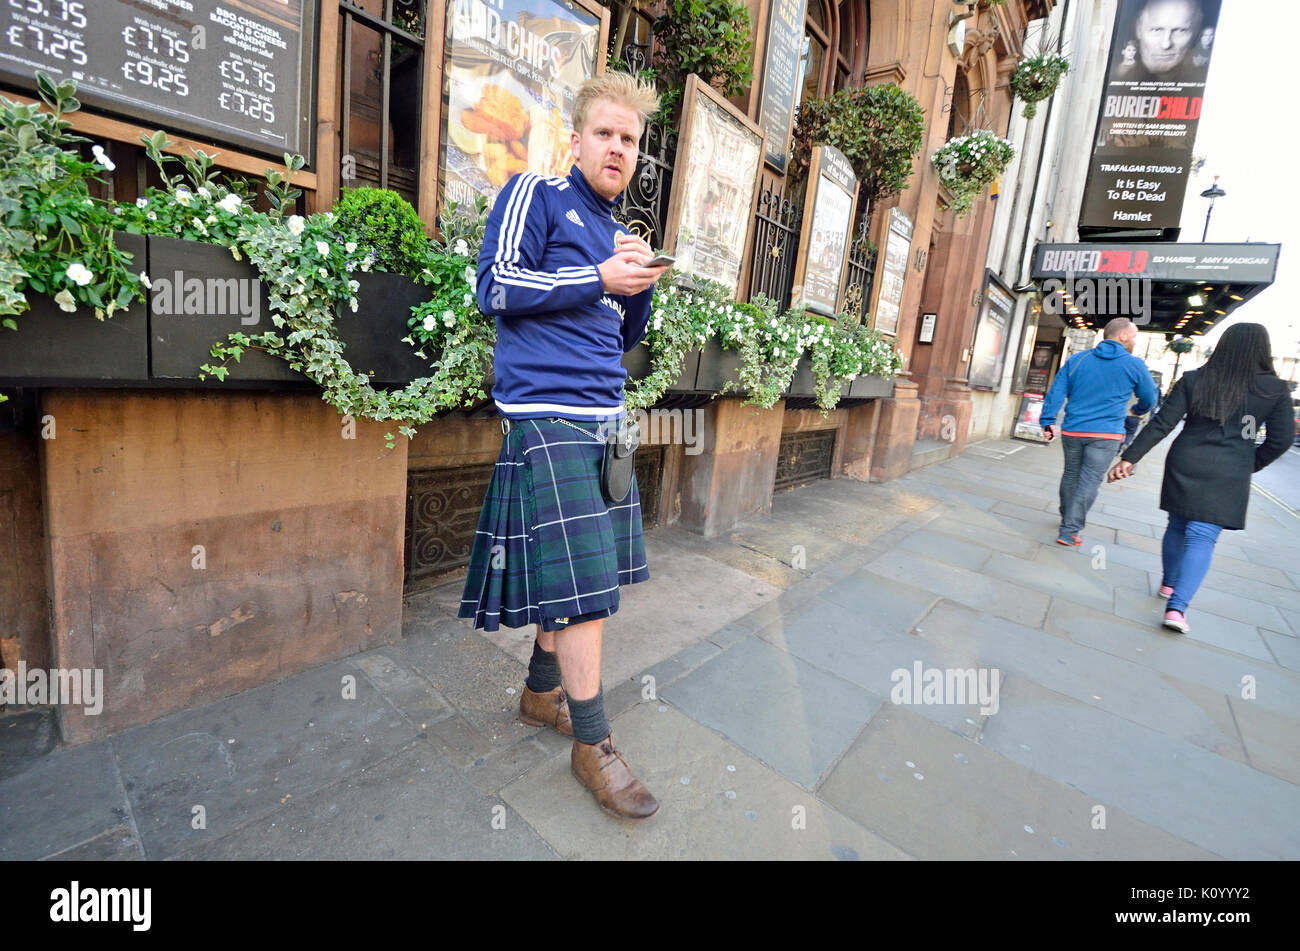 London, England, UK. Mann mit einem Kilt in Whitehall Stockbild